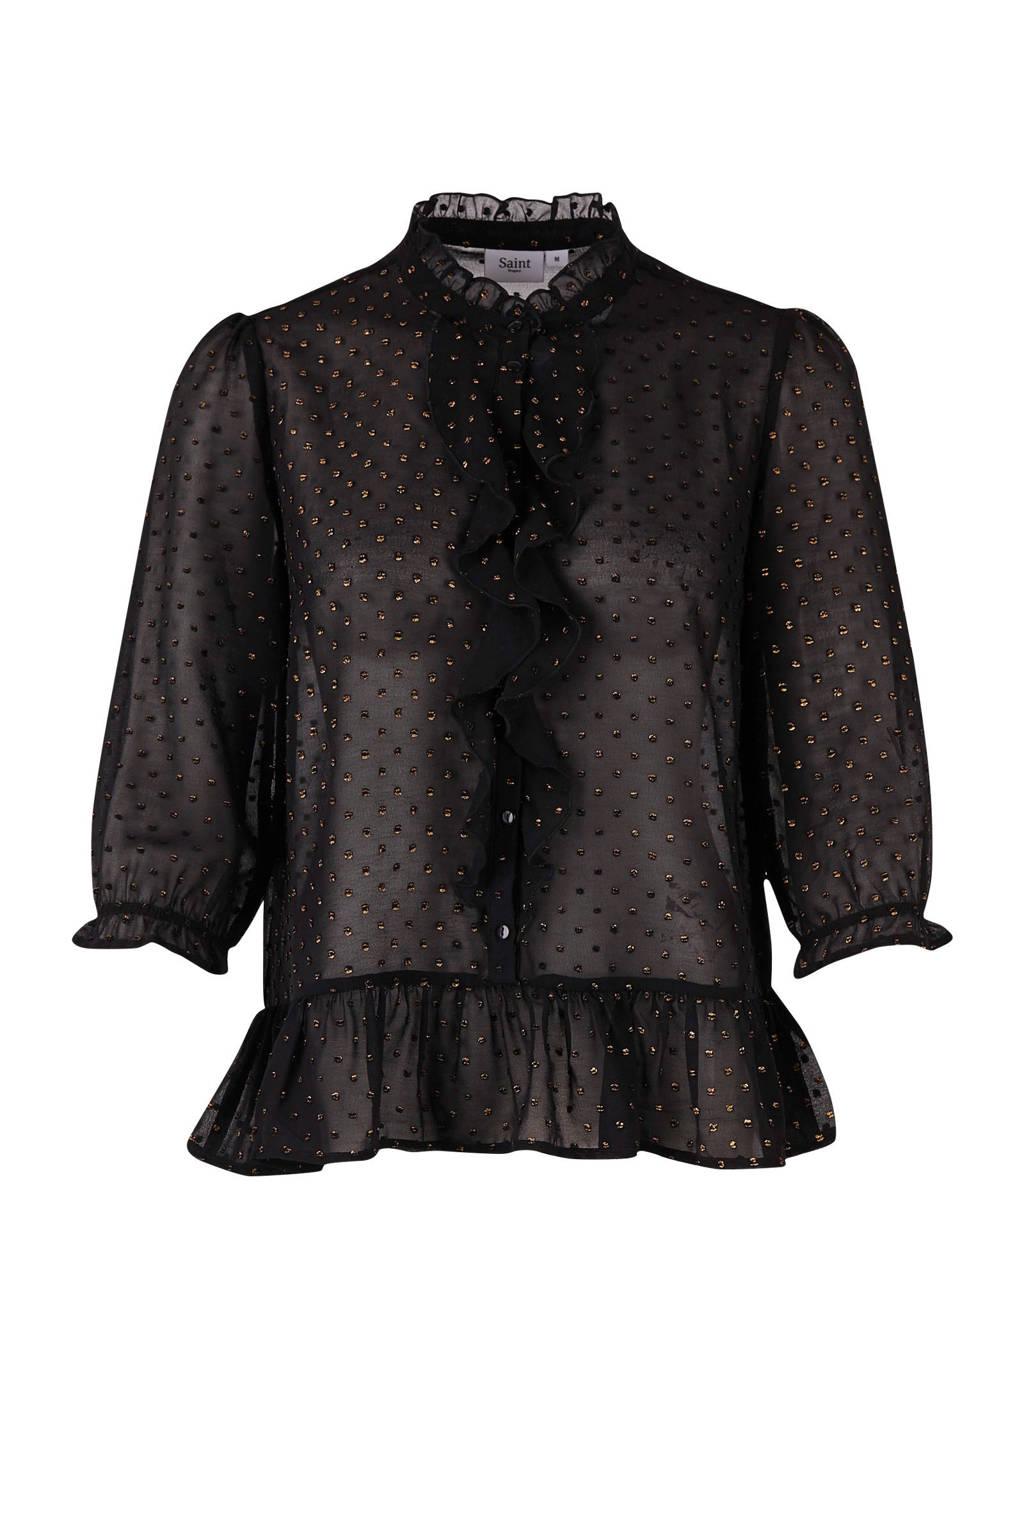 Saint Tropez blouse met glitters, Zwart/goud